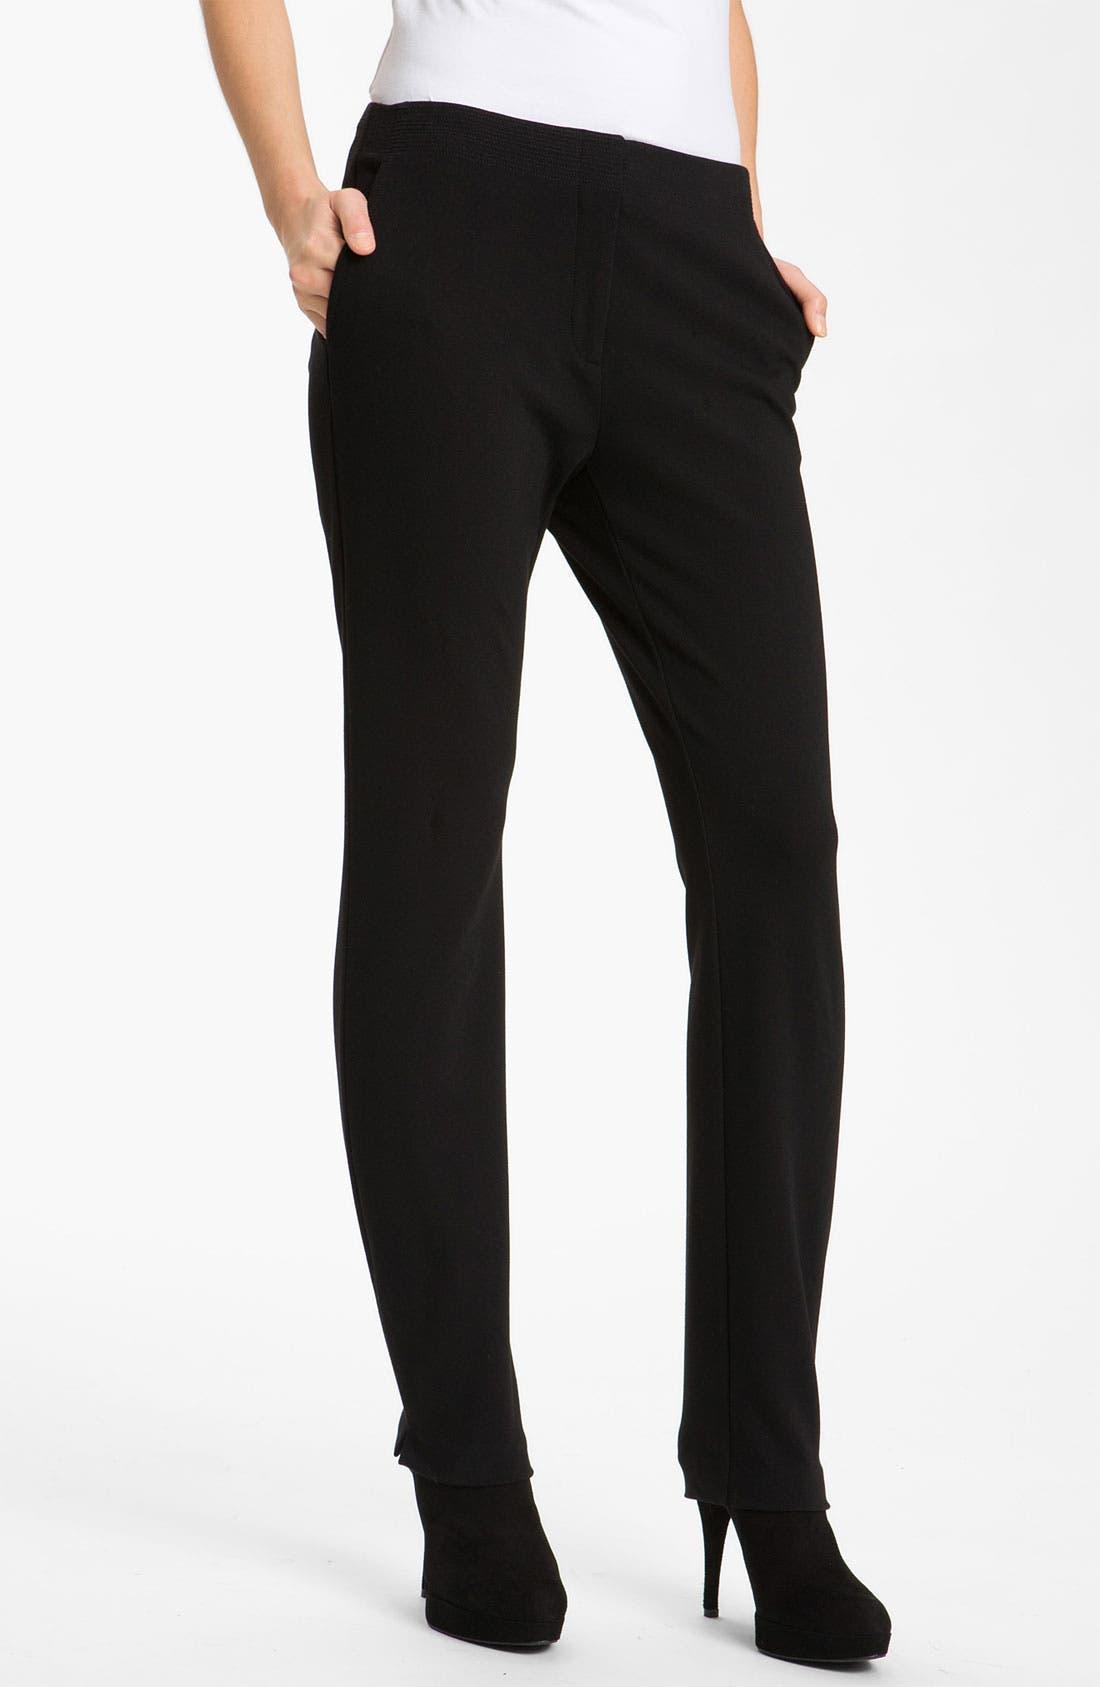 Main Image - Eileen Fisher Slim Ponte Knit Pants (Petite)